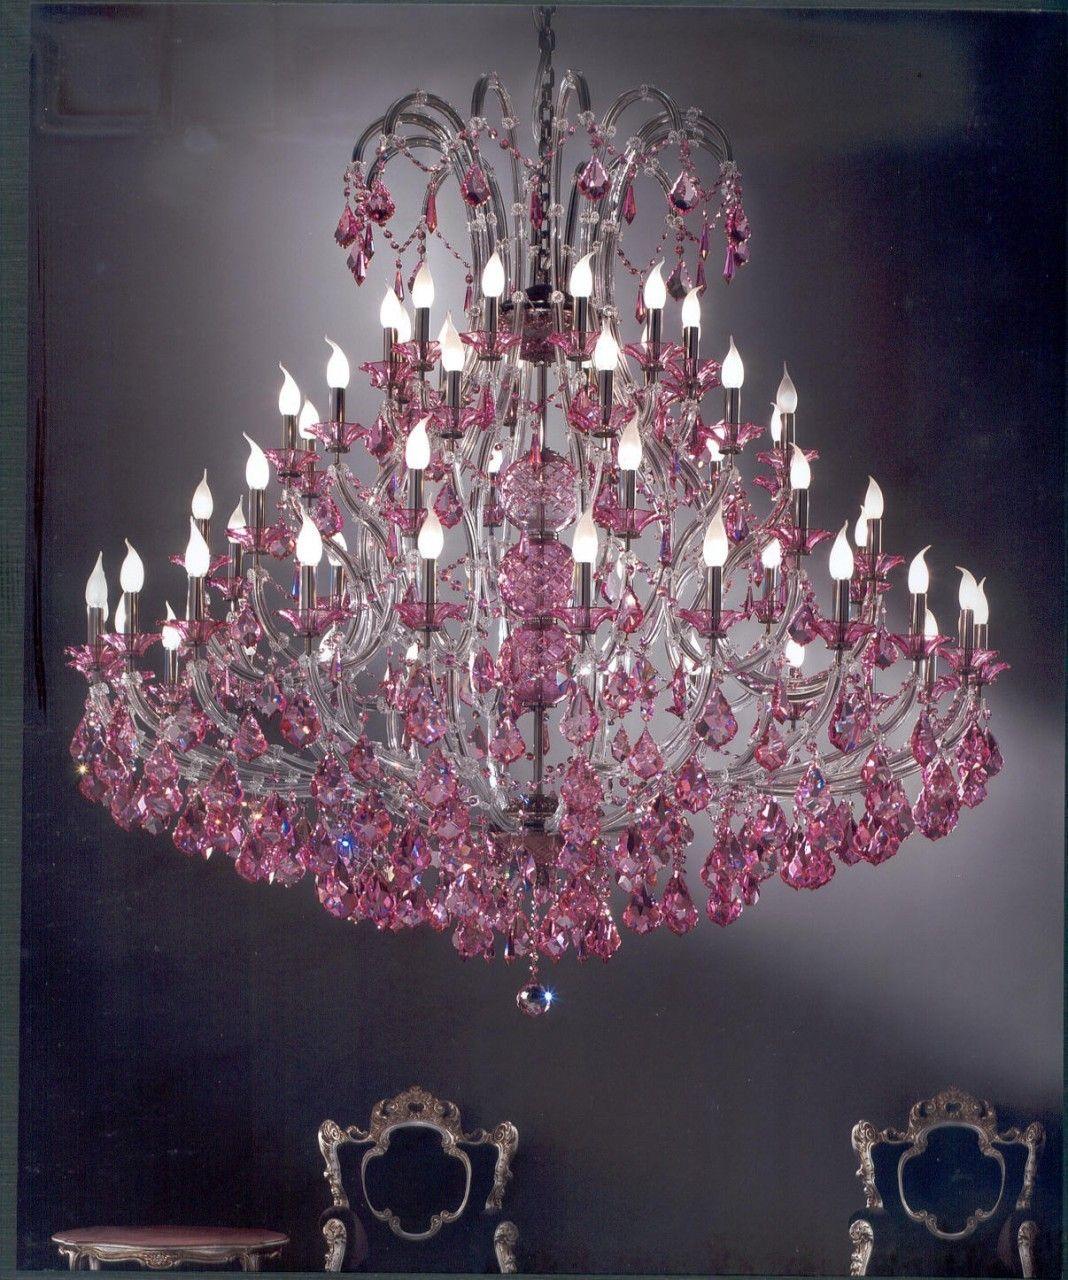 Murano Italian Glass Decor Lights Lighting Lamps And More